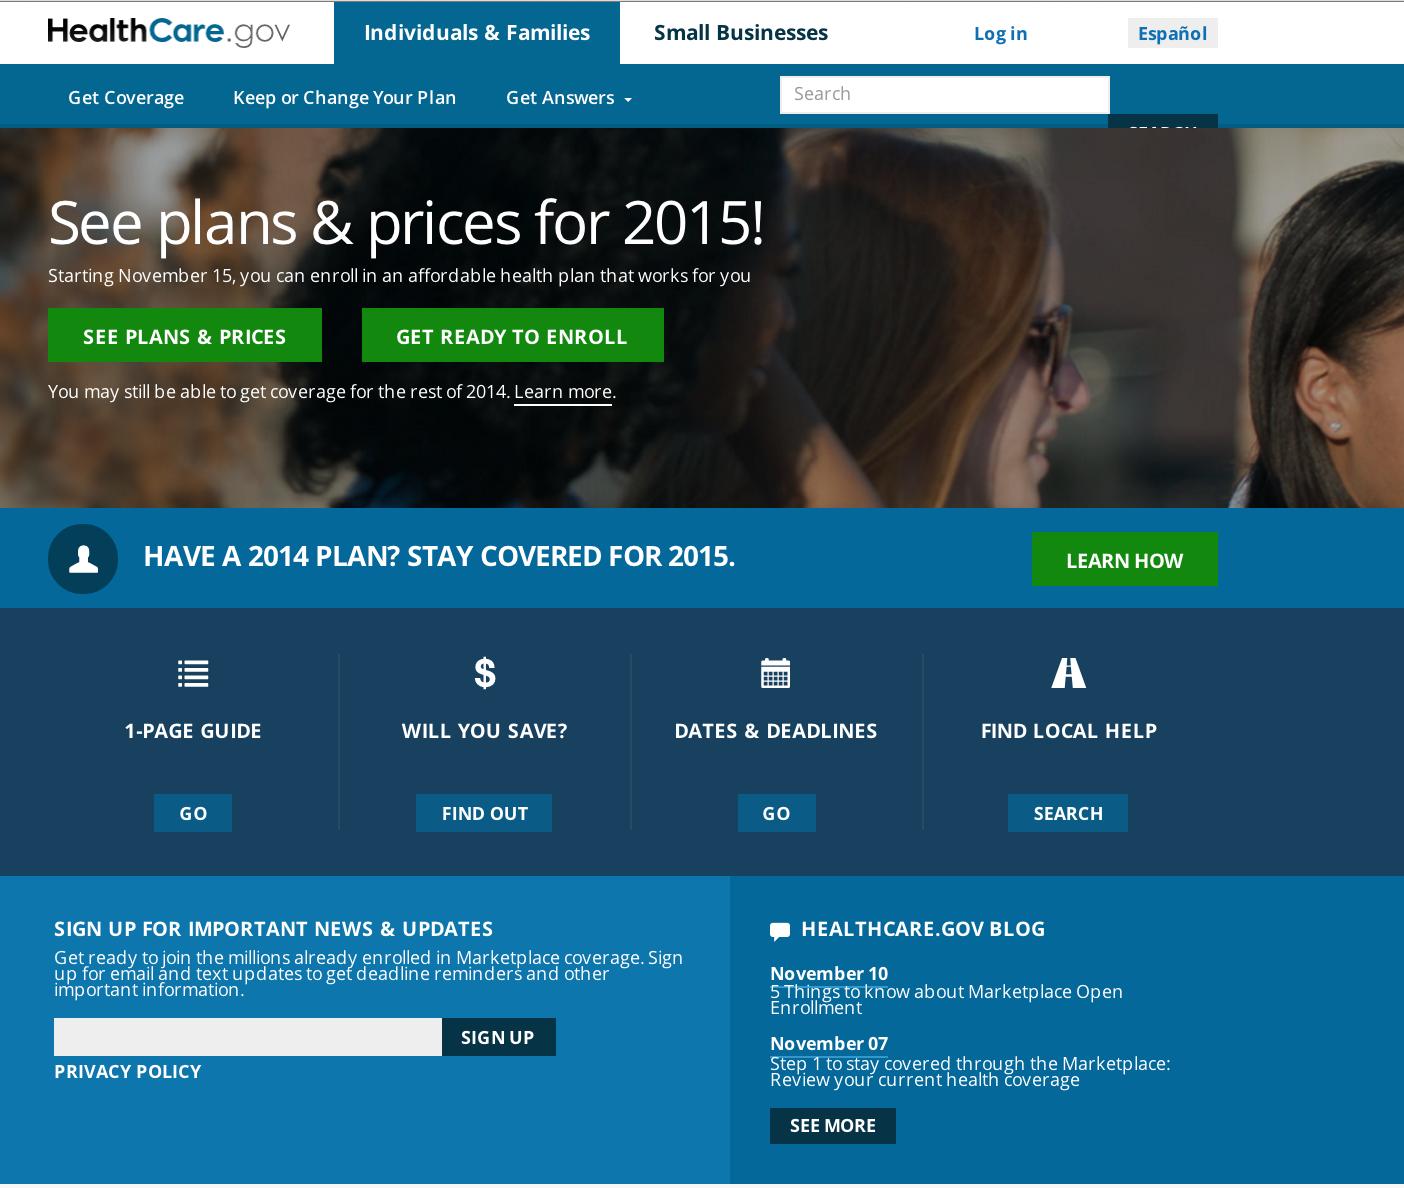 Healthcare .gov plans